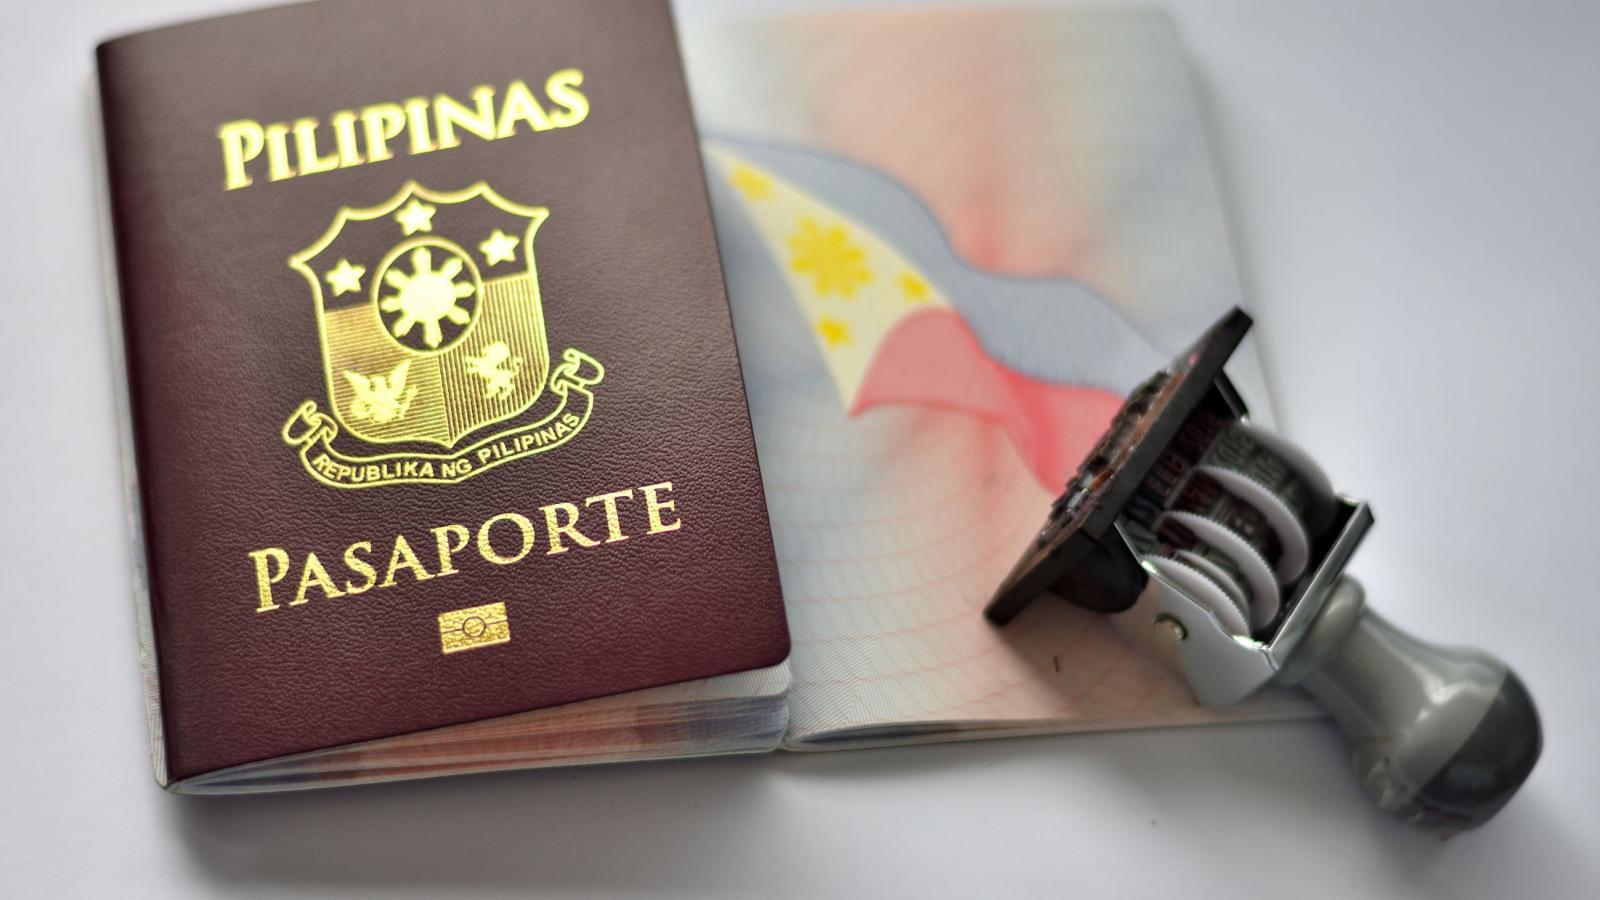 Philippine Embassy announces opening of new passport renewal center in Qatar